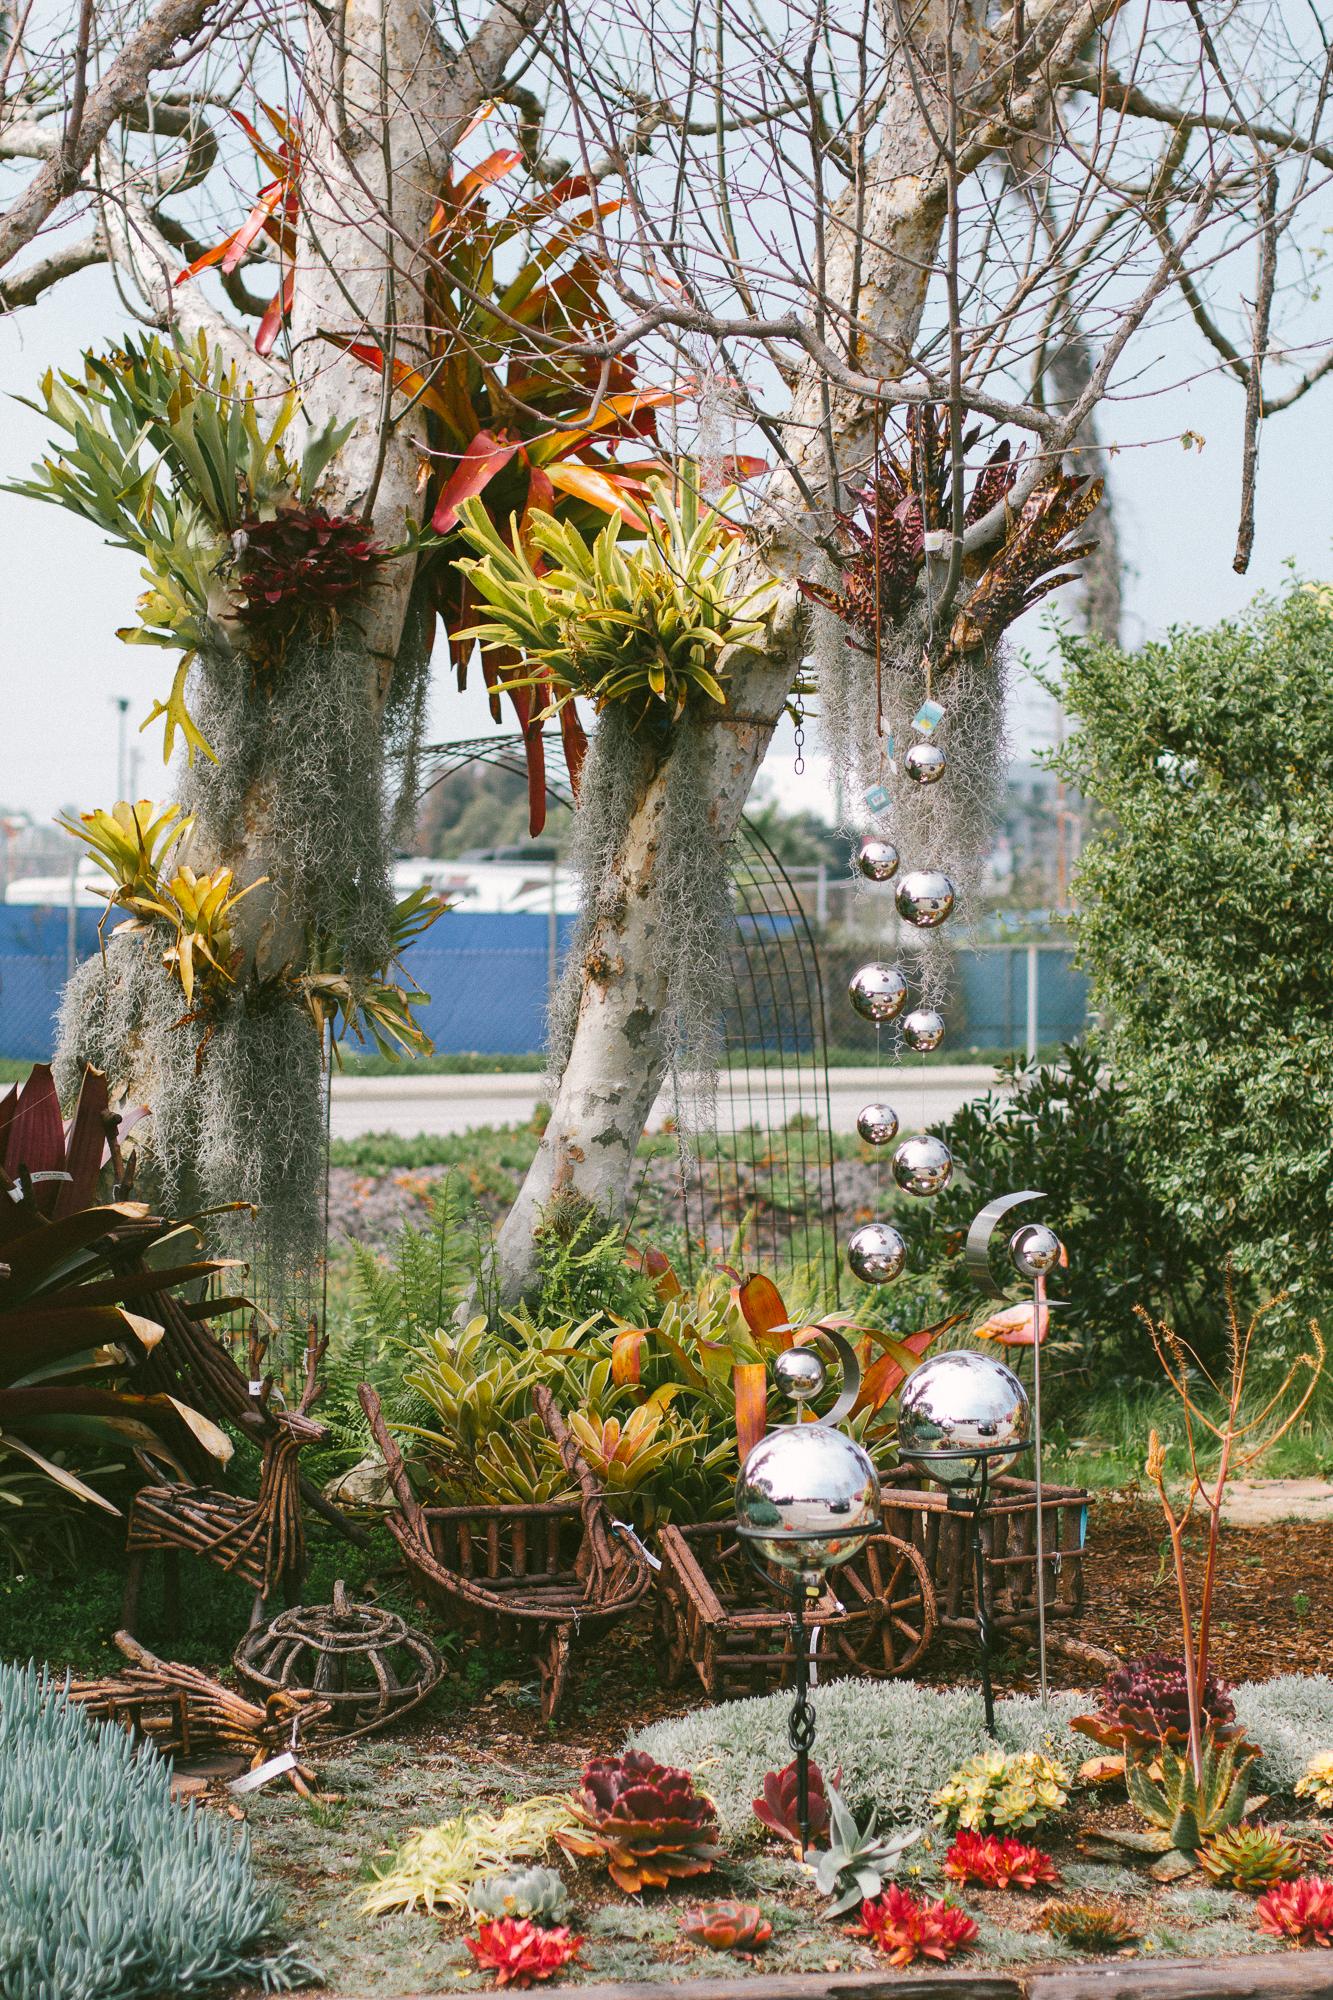 marina del rey garden center 4